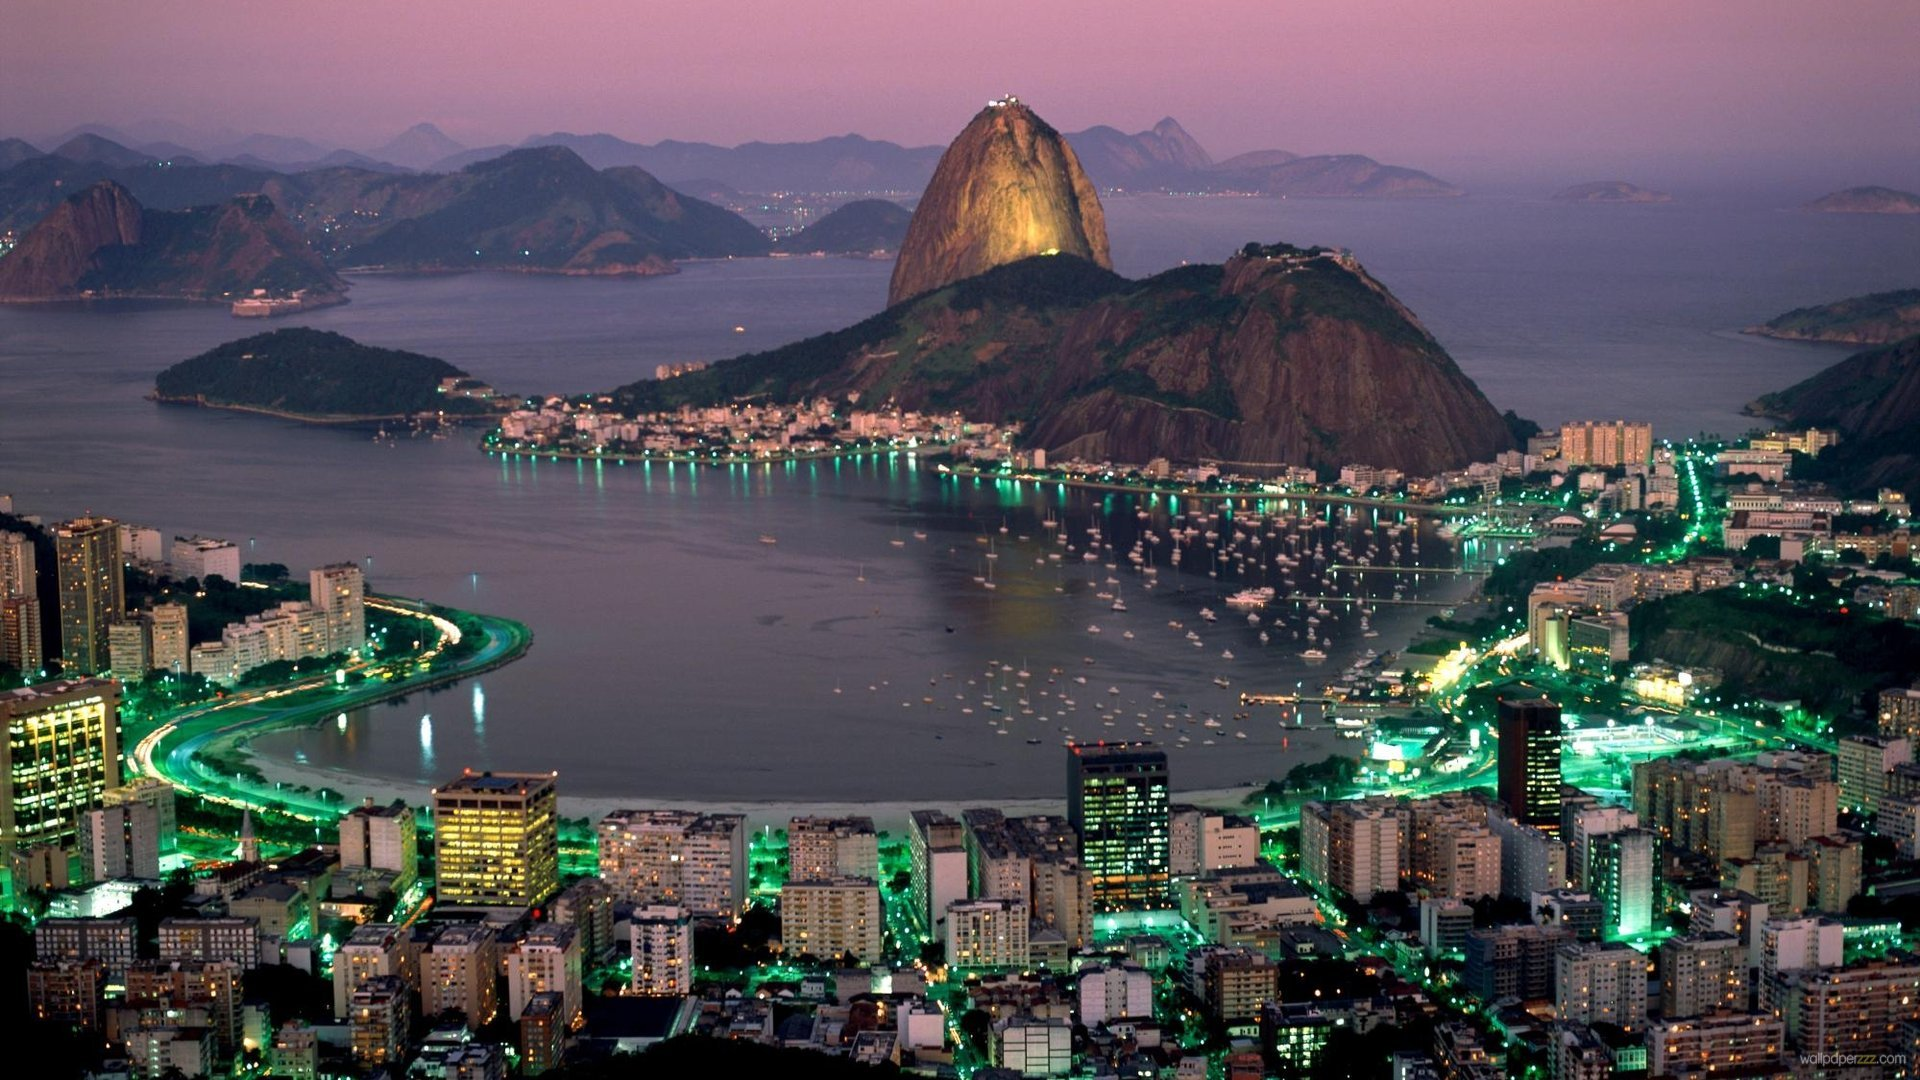 Download Rio De Janeiro HD Wallpaper Wallpaper 1920x1080